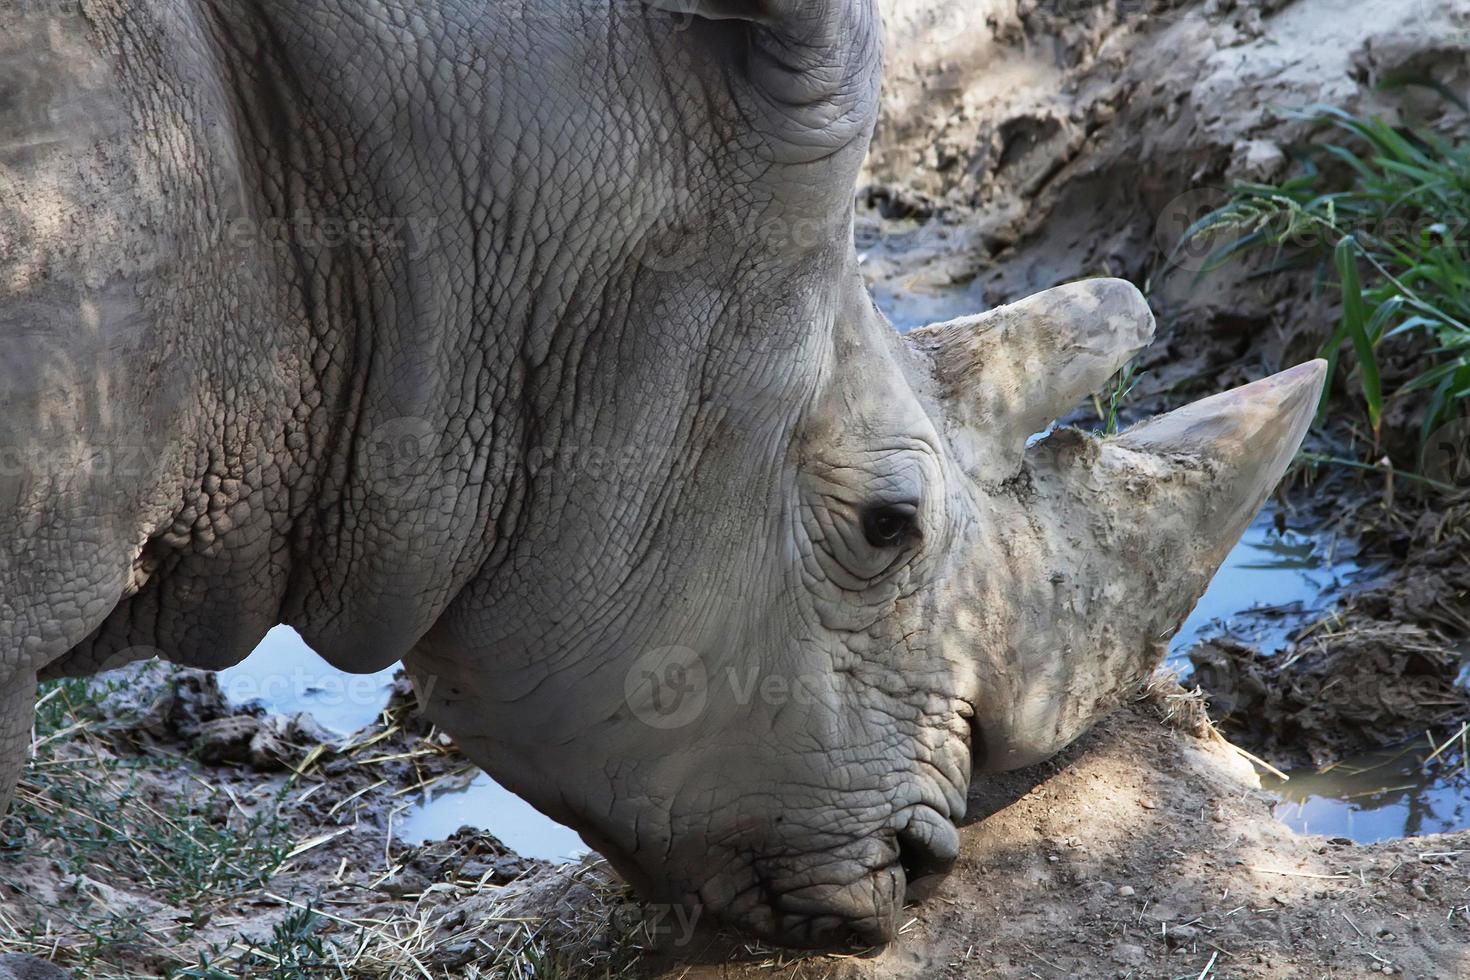 grande rinoceronte africano foto